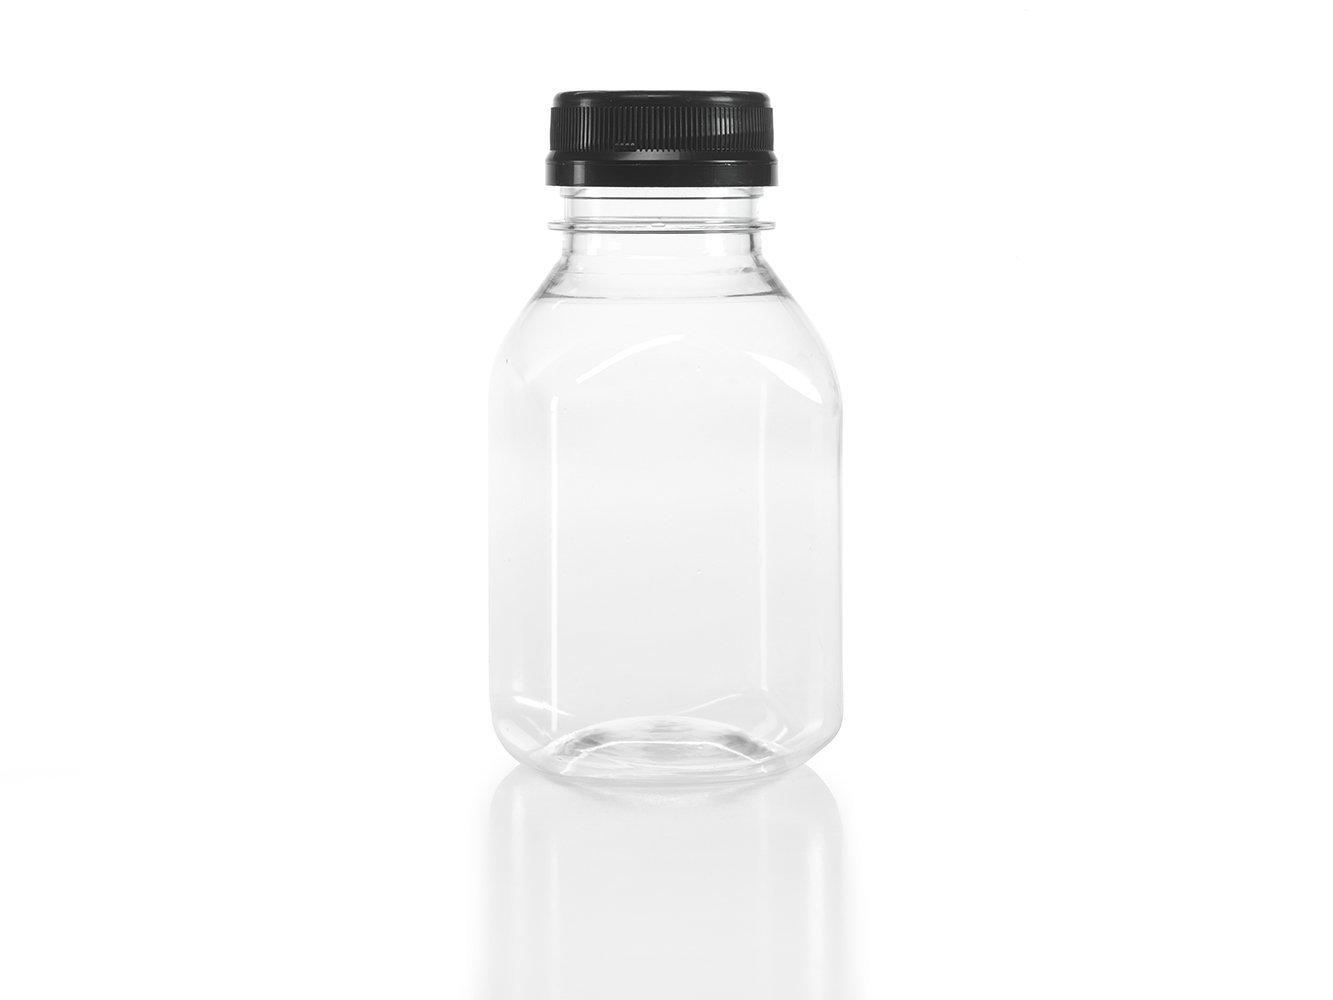 (24) 8 oz. Clear Food Grade Plastic Juice Bottles with Black Caps (24/Pack)